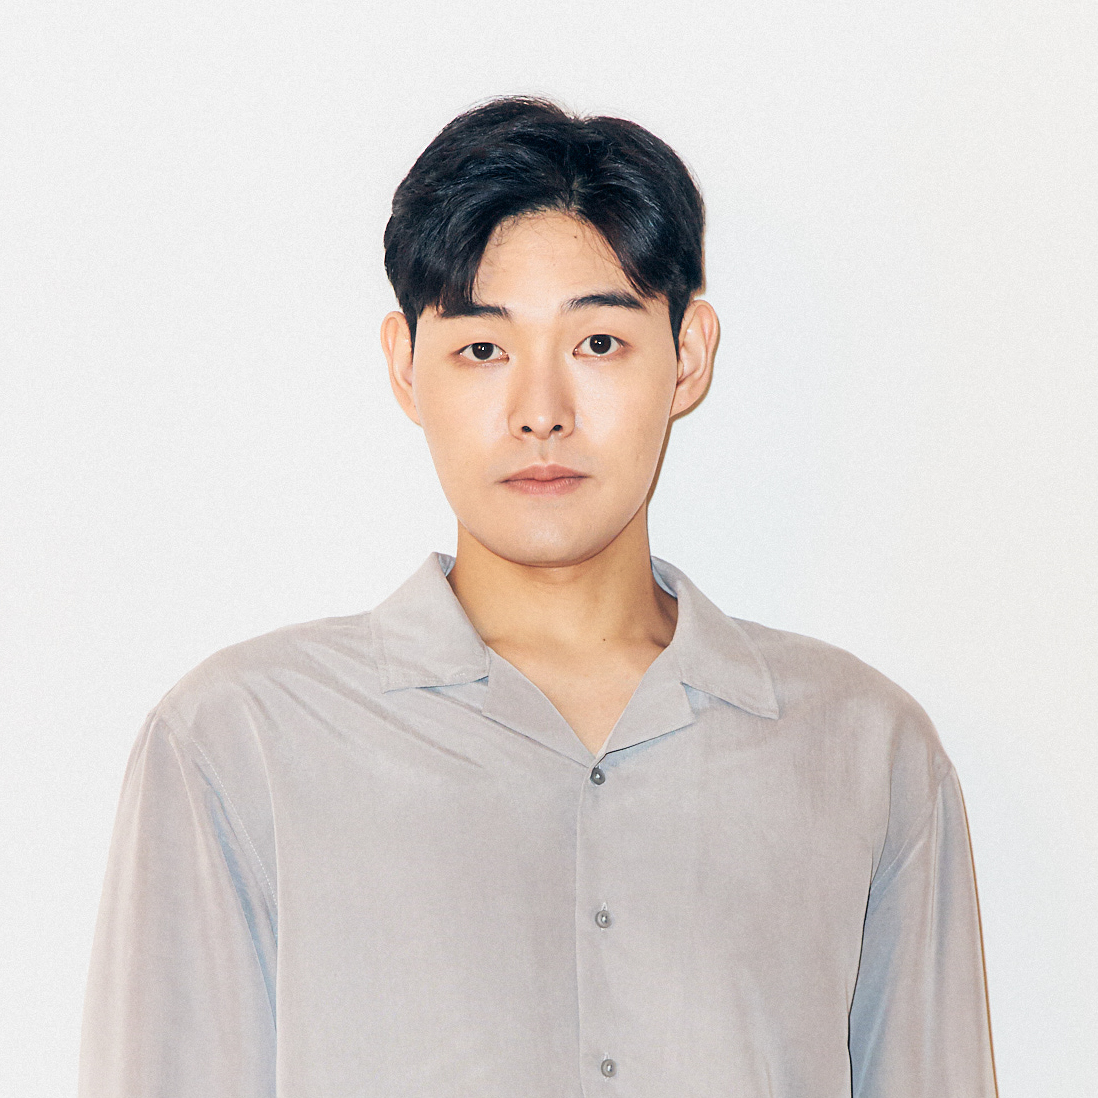 <b>정이삭<br>Jeong Ei Sack</b>